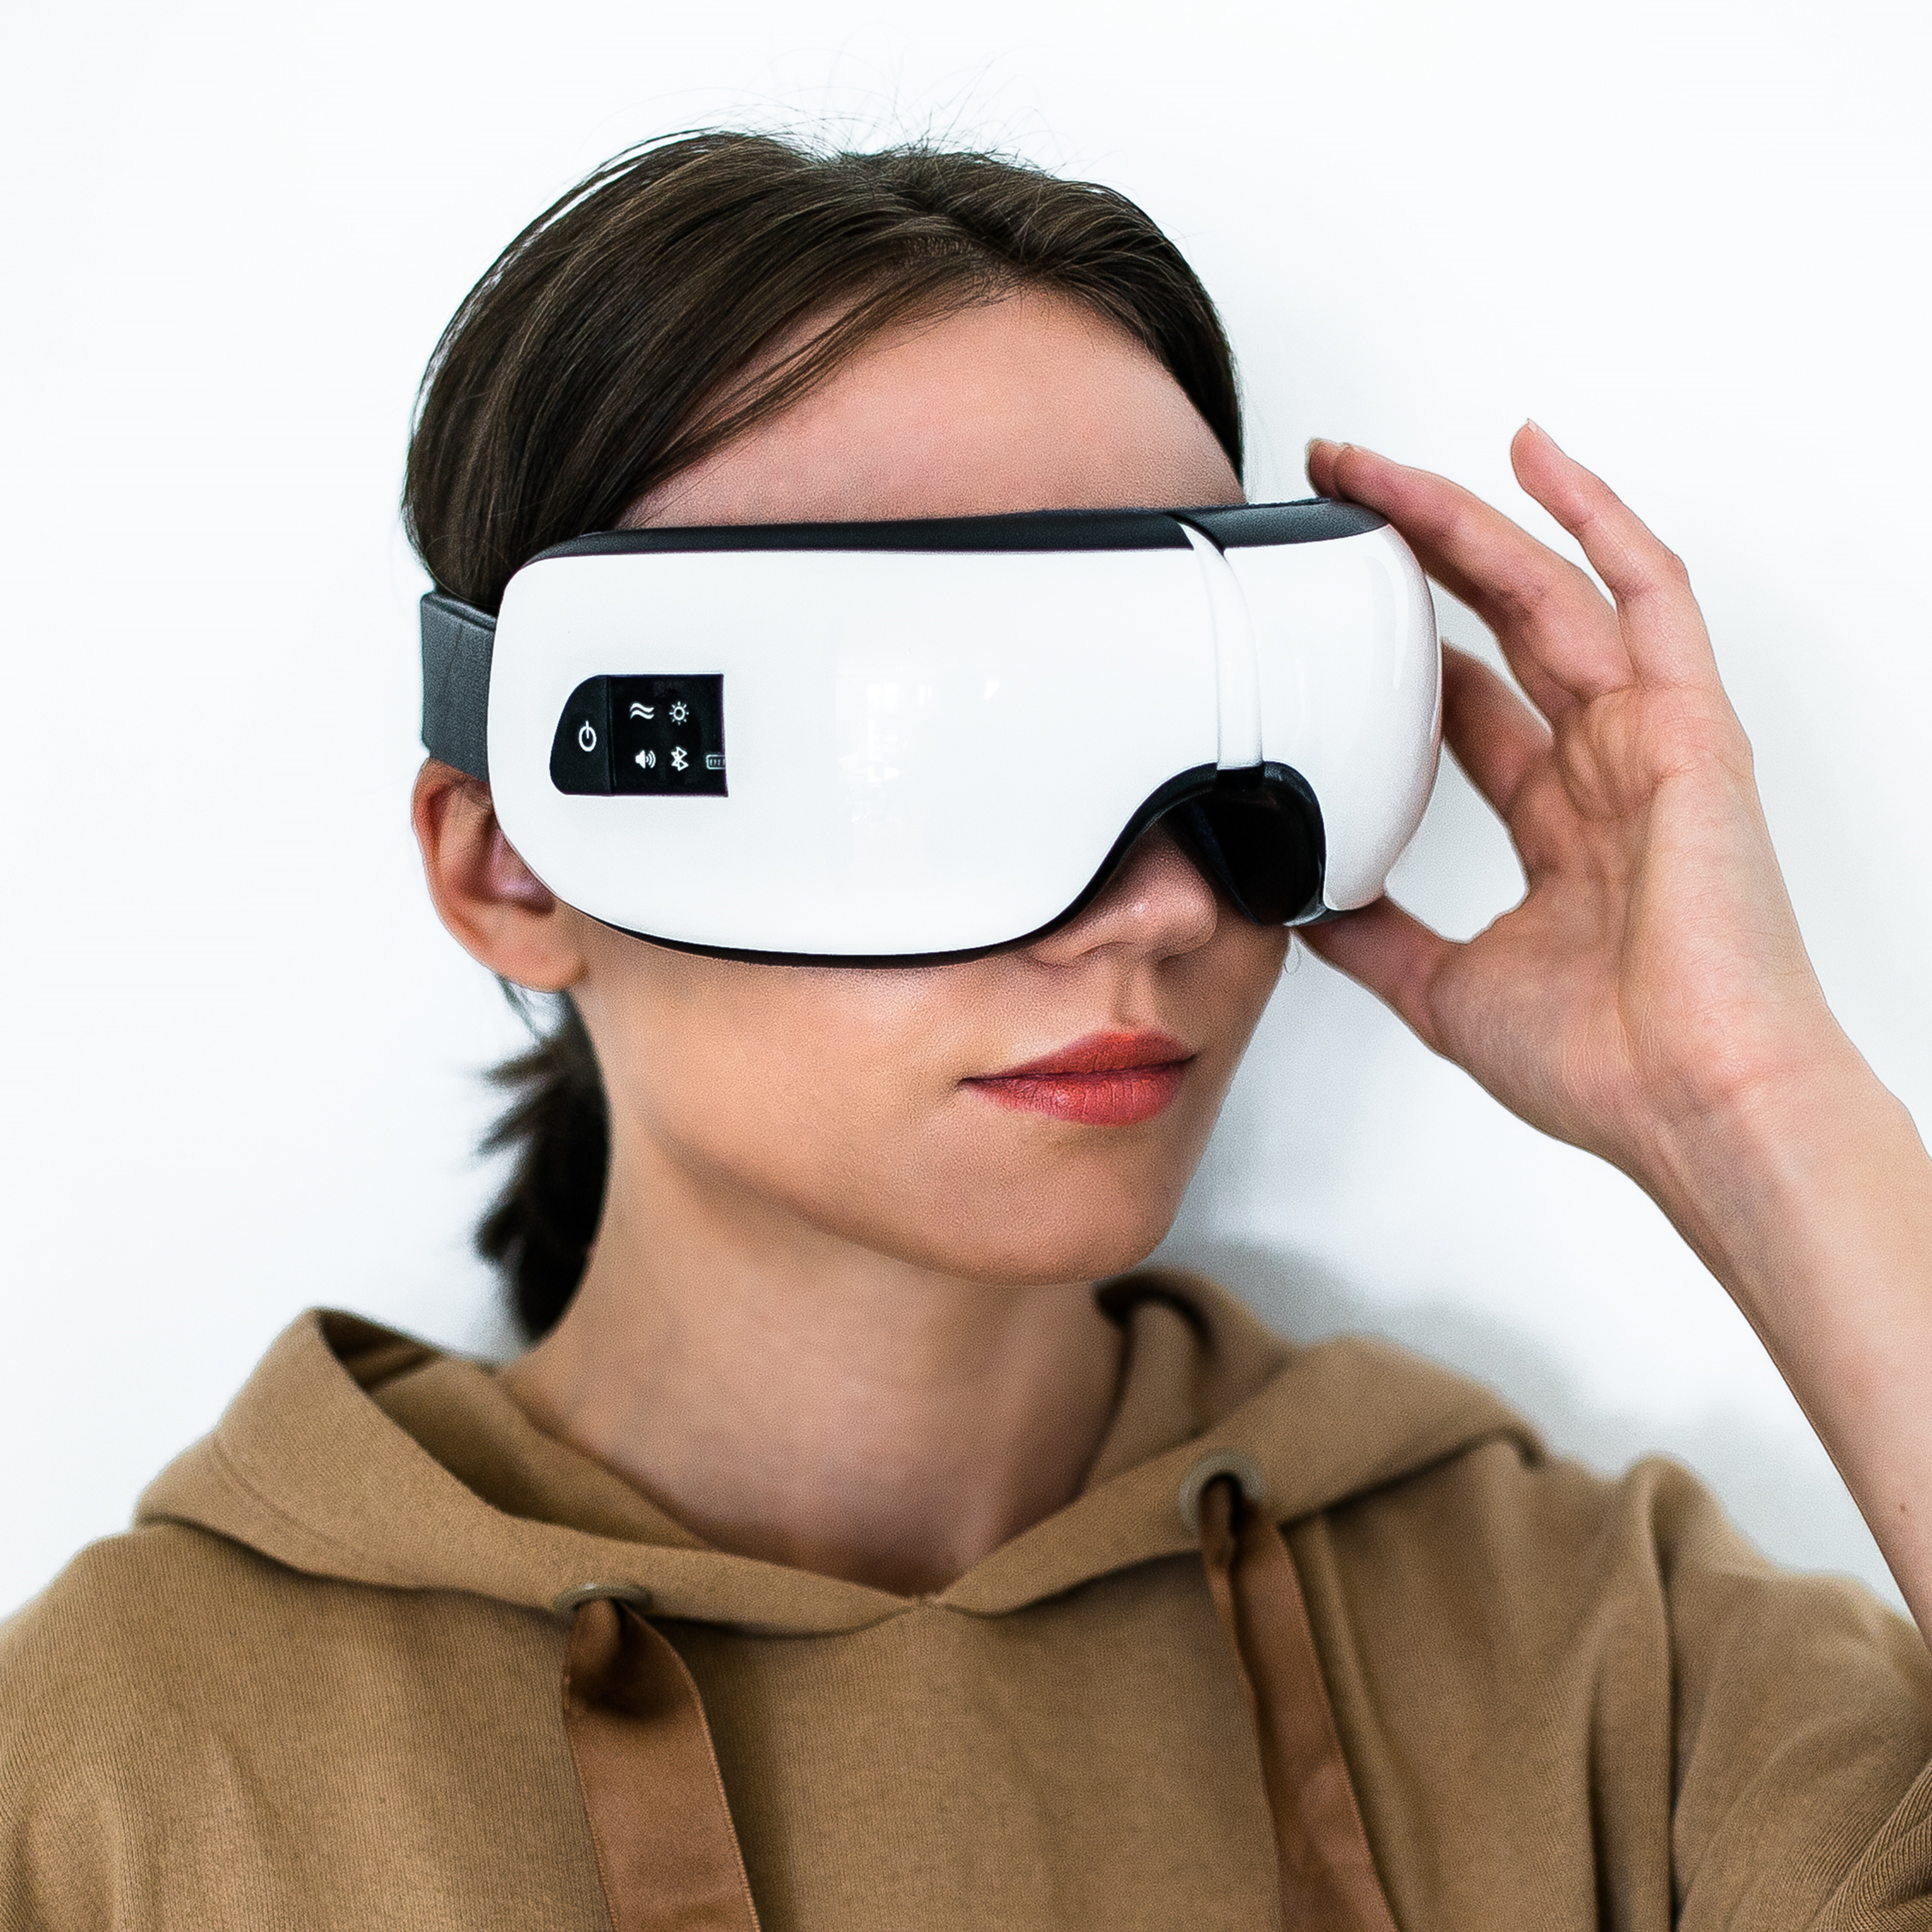 Hot DealsSmart-Eye-Massager Tired Heated-Goggles Travel-Case Eyes Dark-Circles Anti-Wrinkles-Eyes